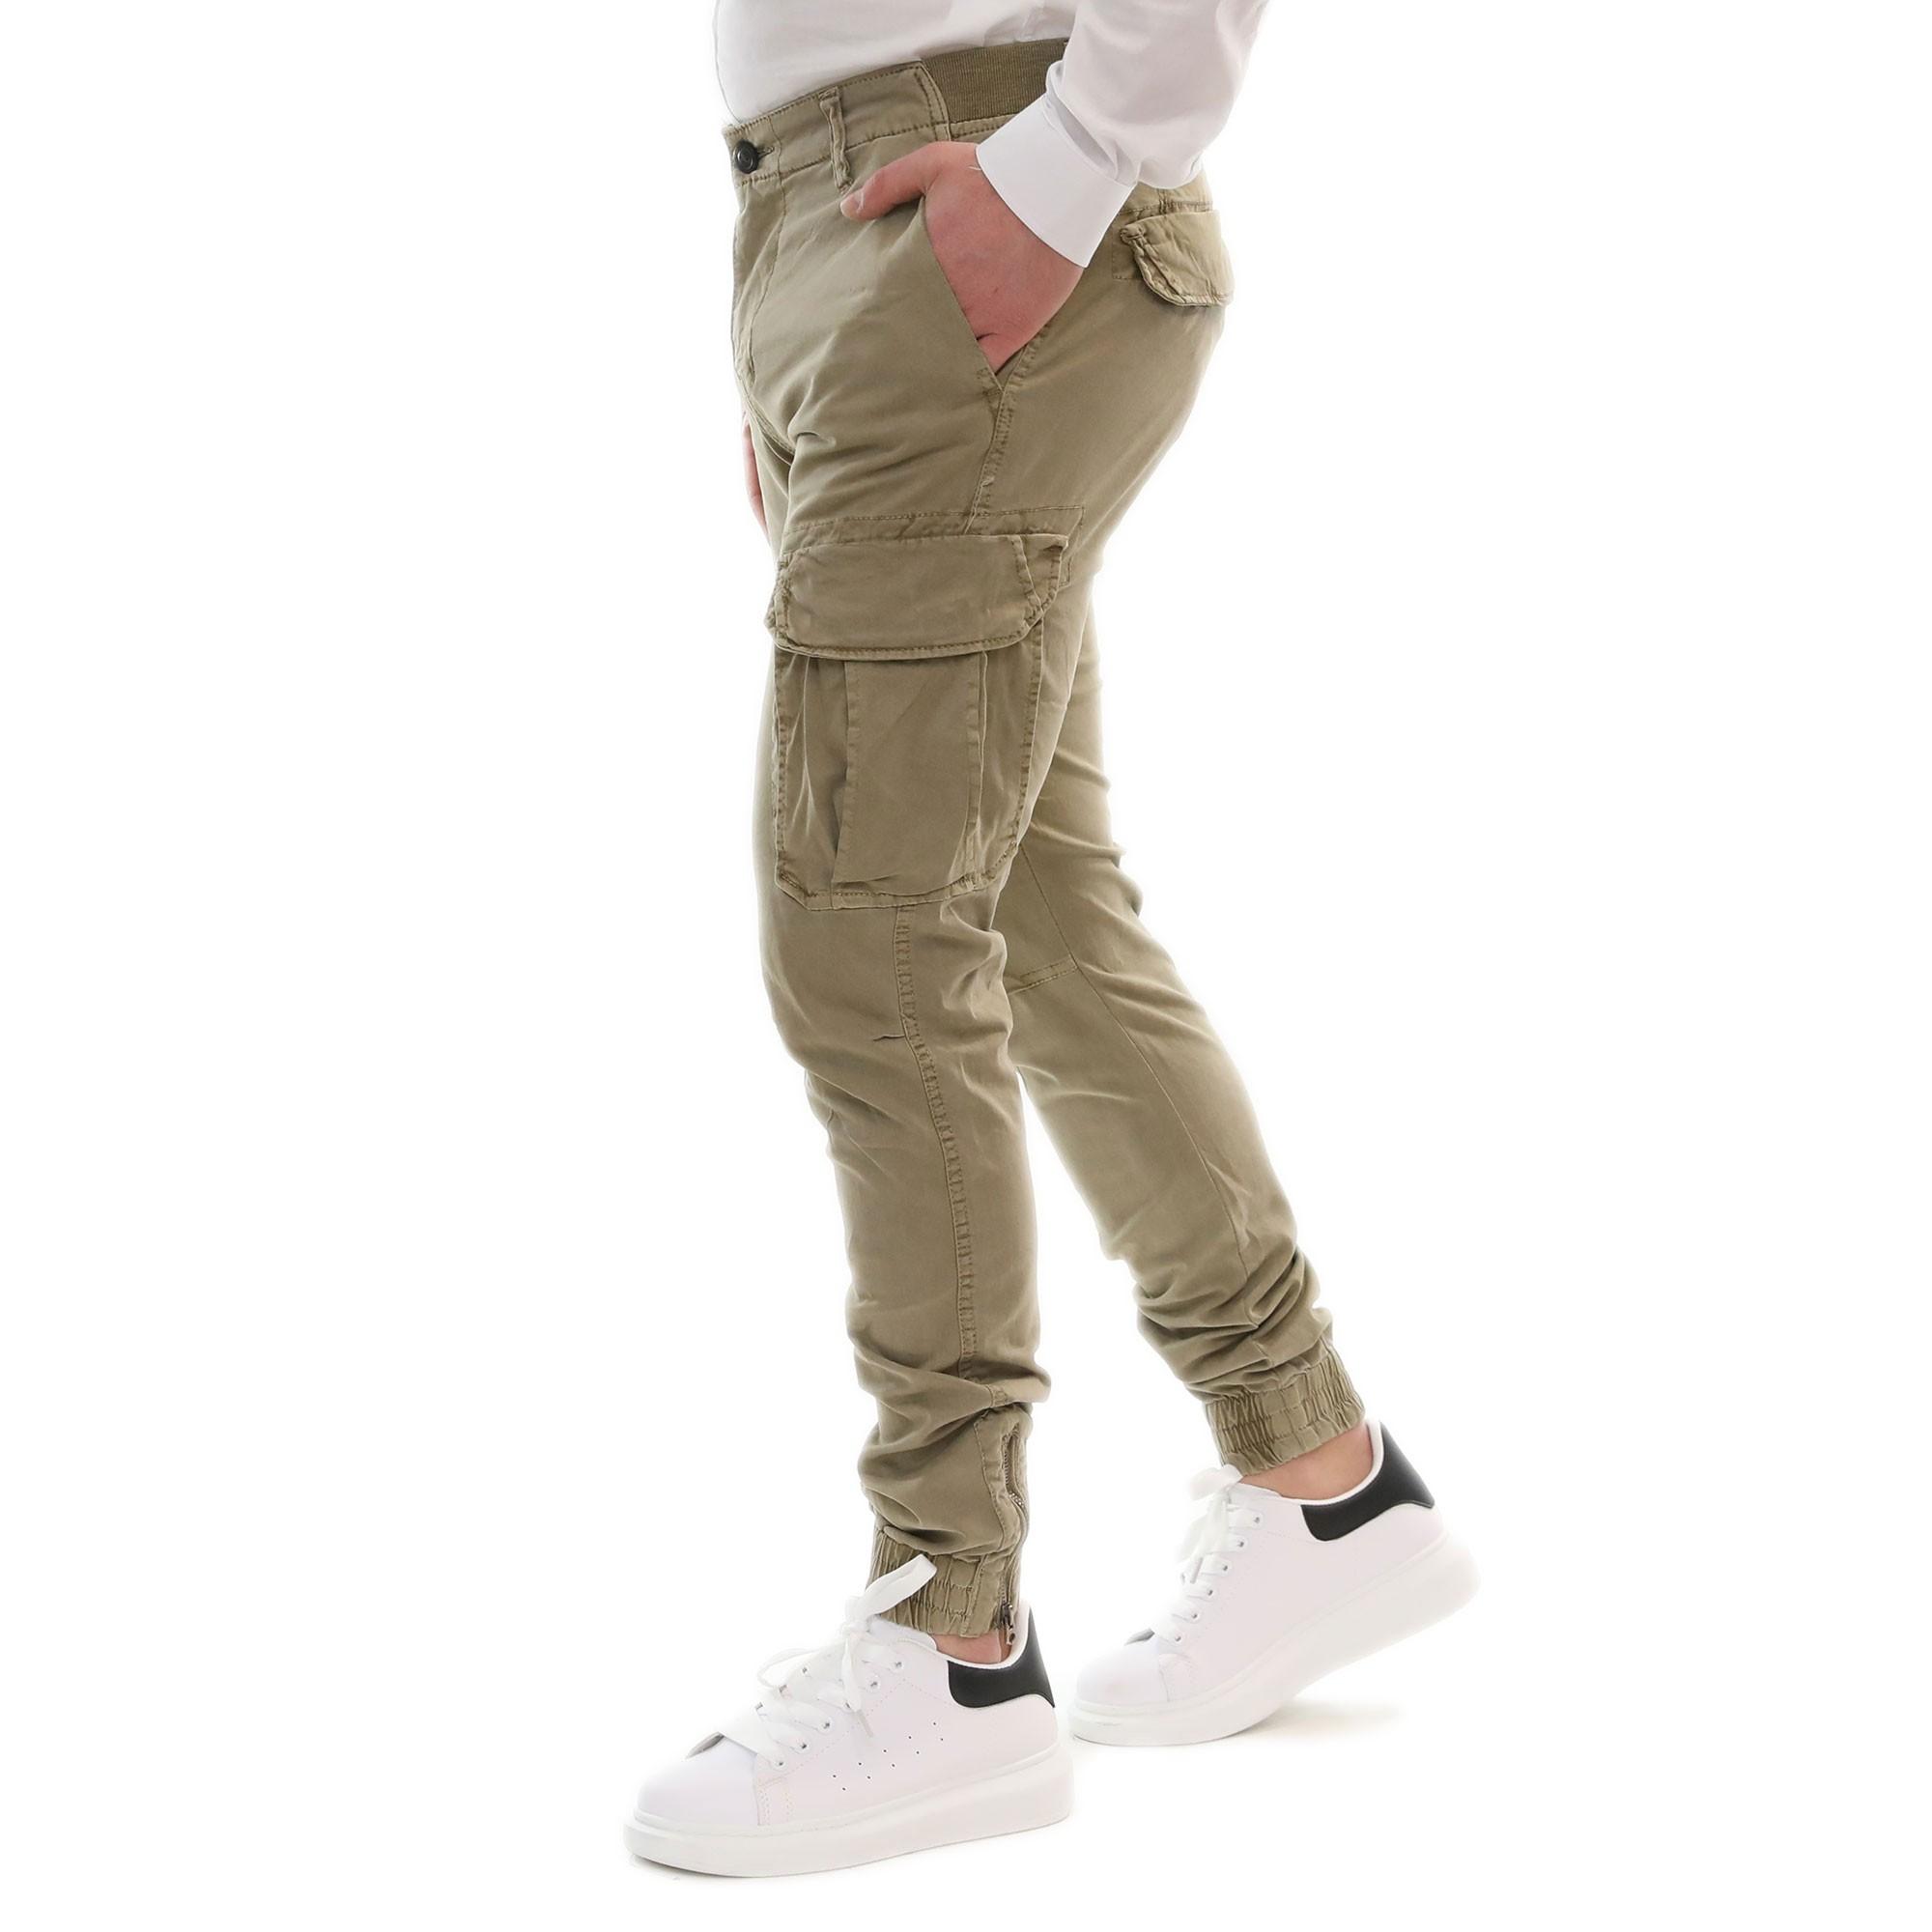 Pantalone-Uomo-Cargo-Primaverile-Con-Tasconi-Verde-Blu-Beige-SlimFit-Pantaloni miniatura 9